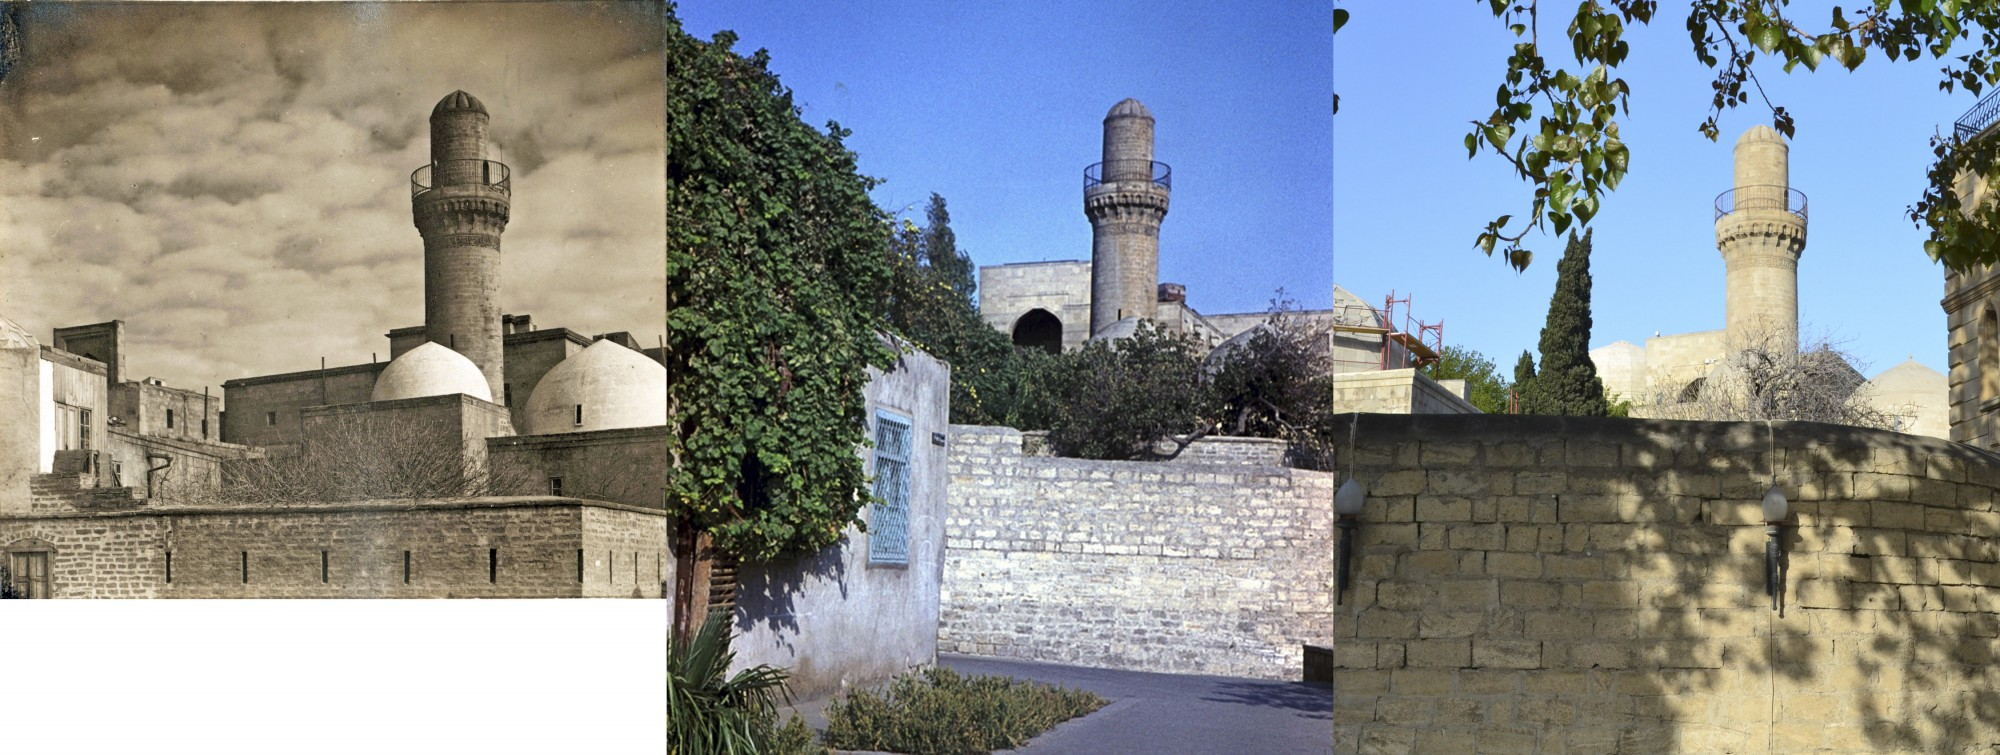 Баку. Дворец Ширваншахов. Минарет Шахской мечети 1912-1968-2015